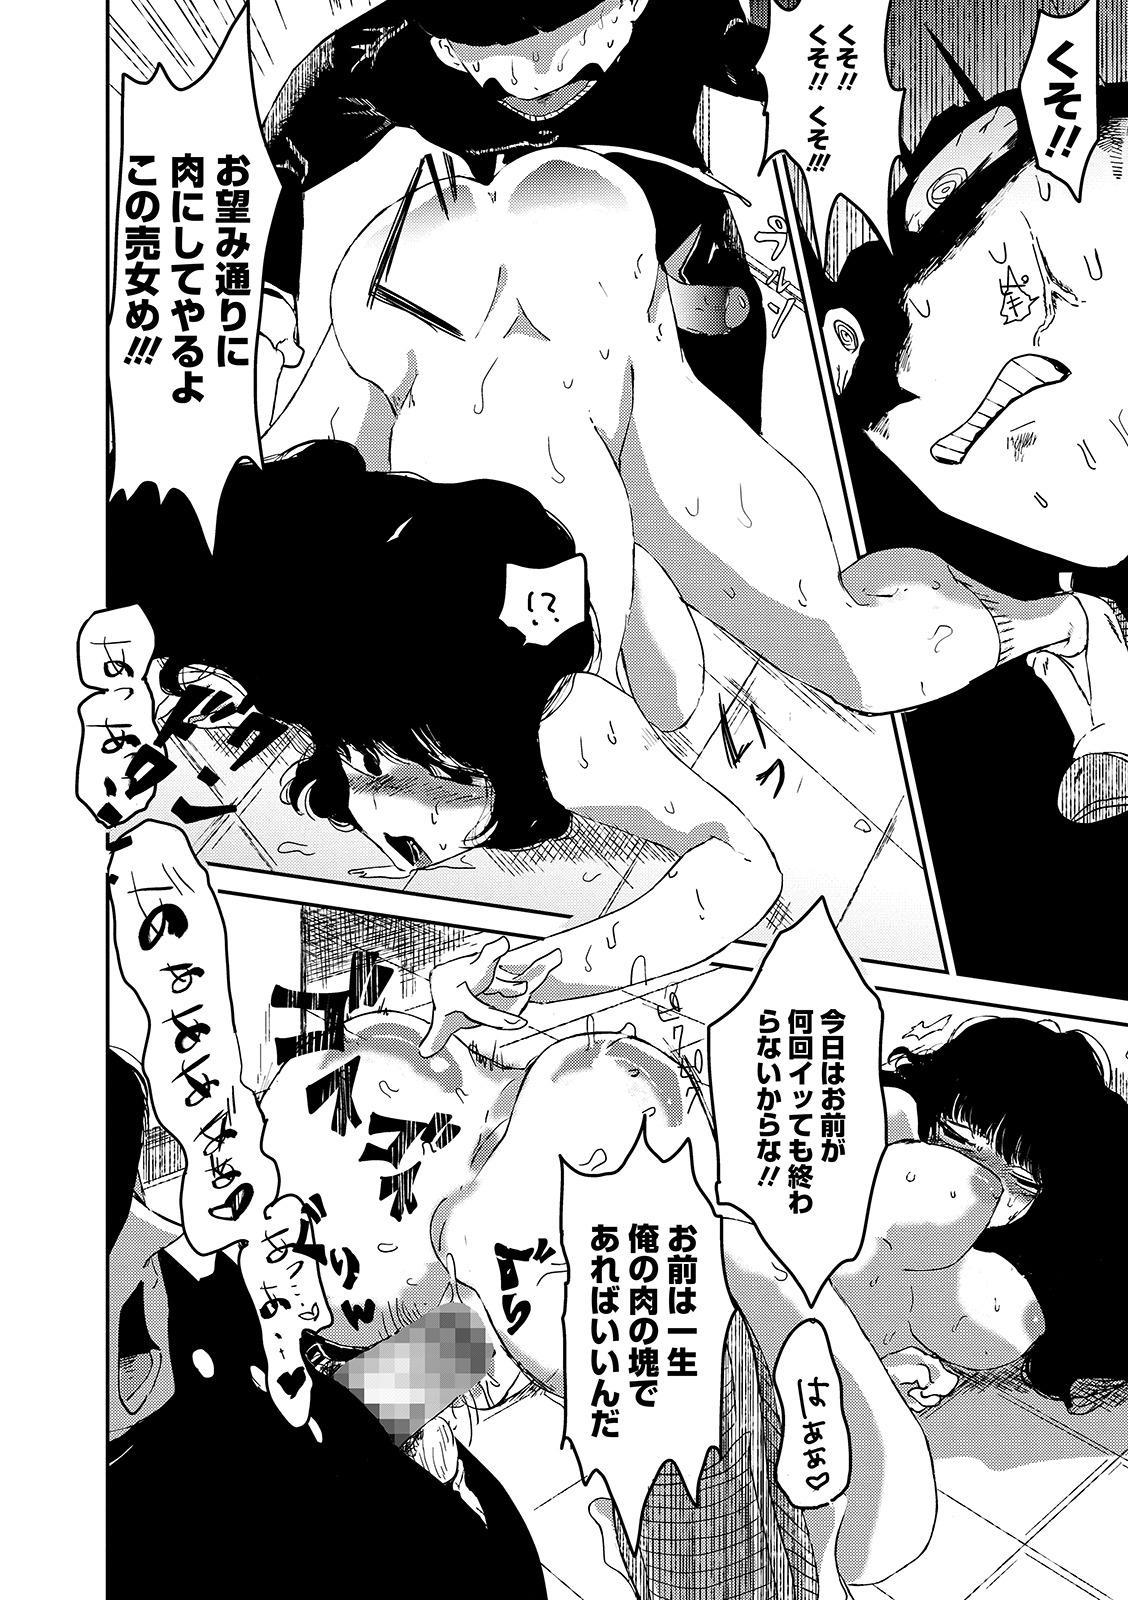 COMIC Shigekiteki SQUIRT!! Vol. 15 237